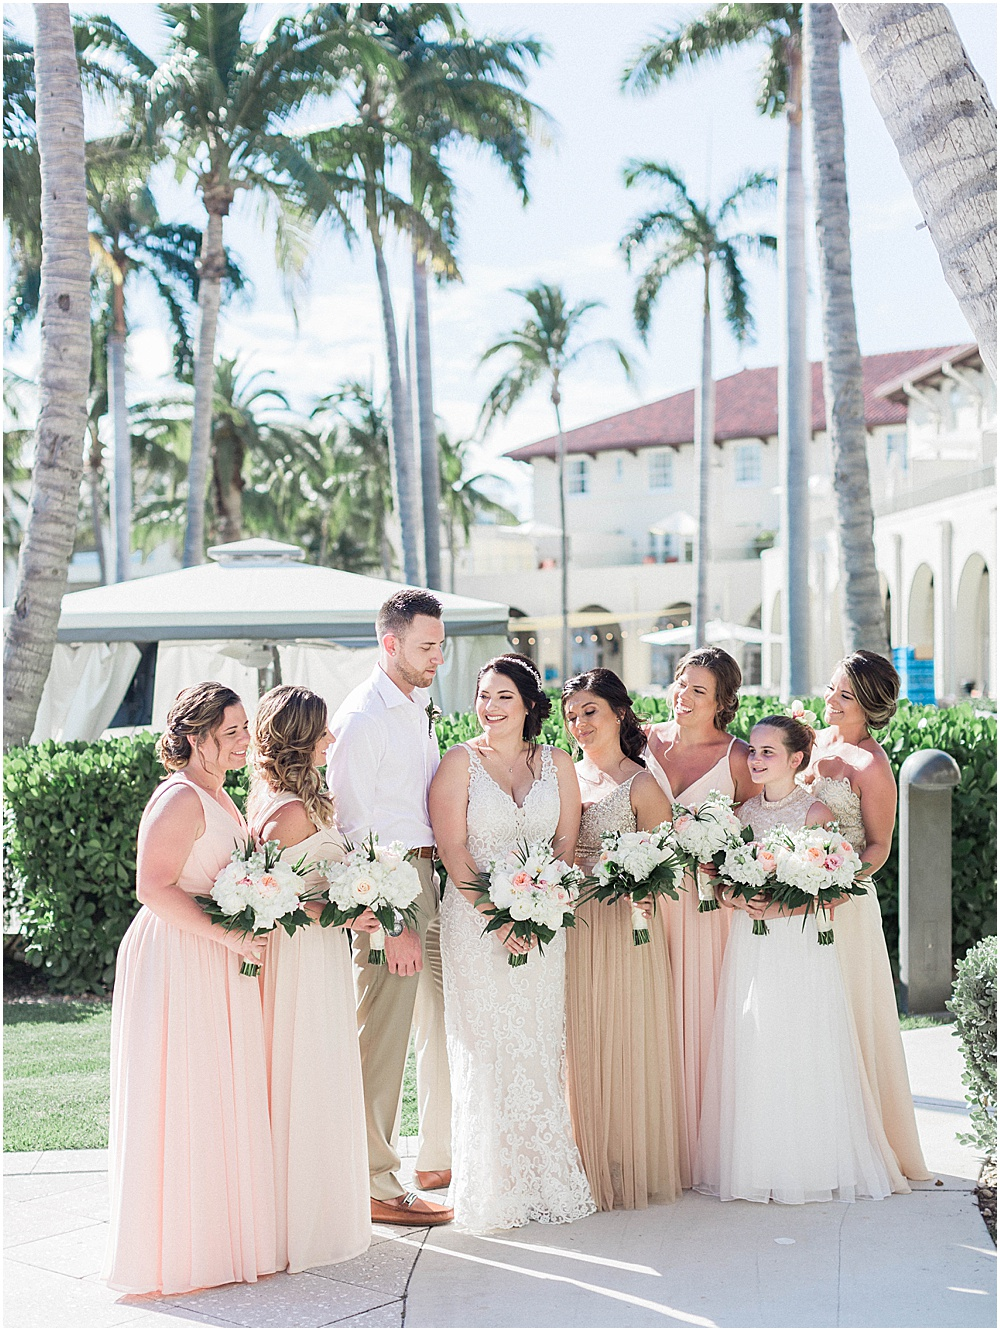 casa_marina_key_west_florida_destination_palm_trees_boston_wedding_photographer_meredith_jane_photography_photo_0089.jpg